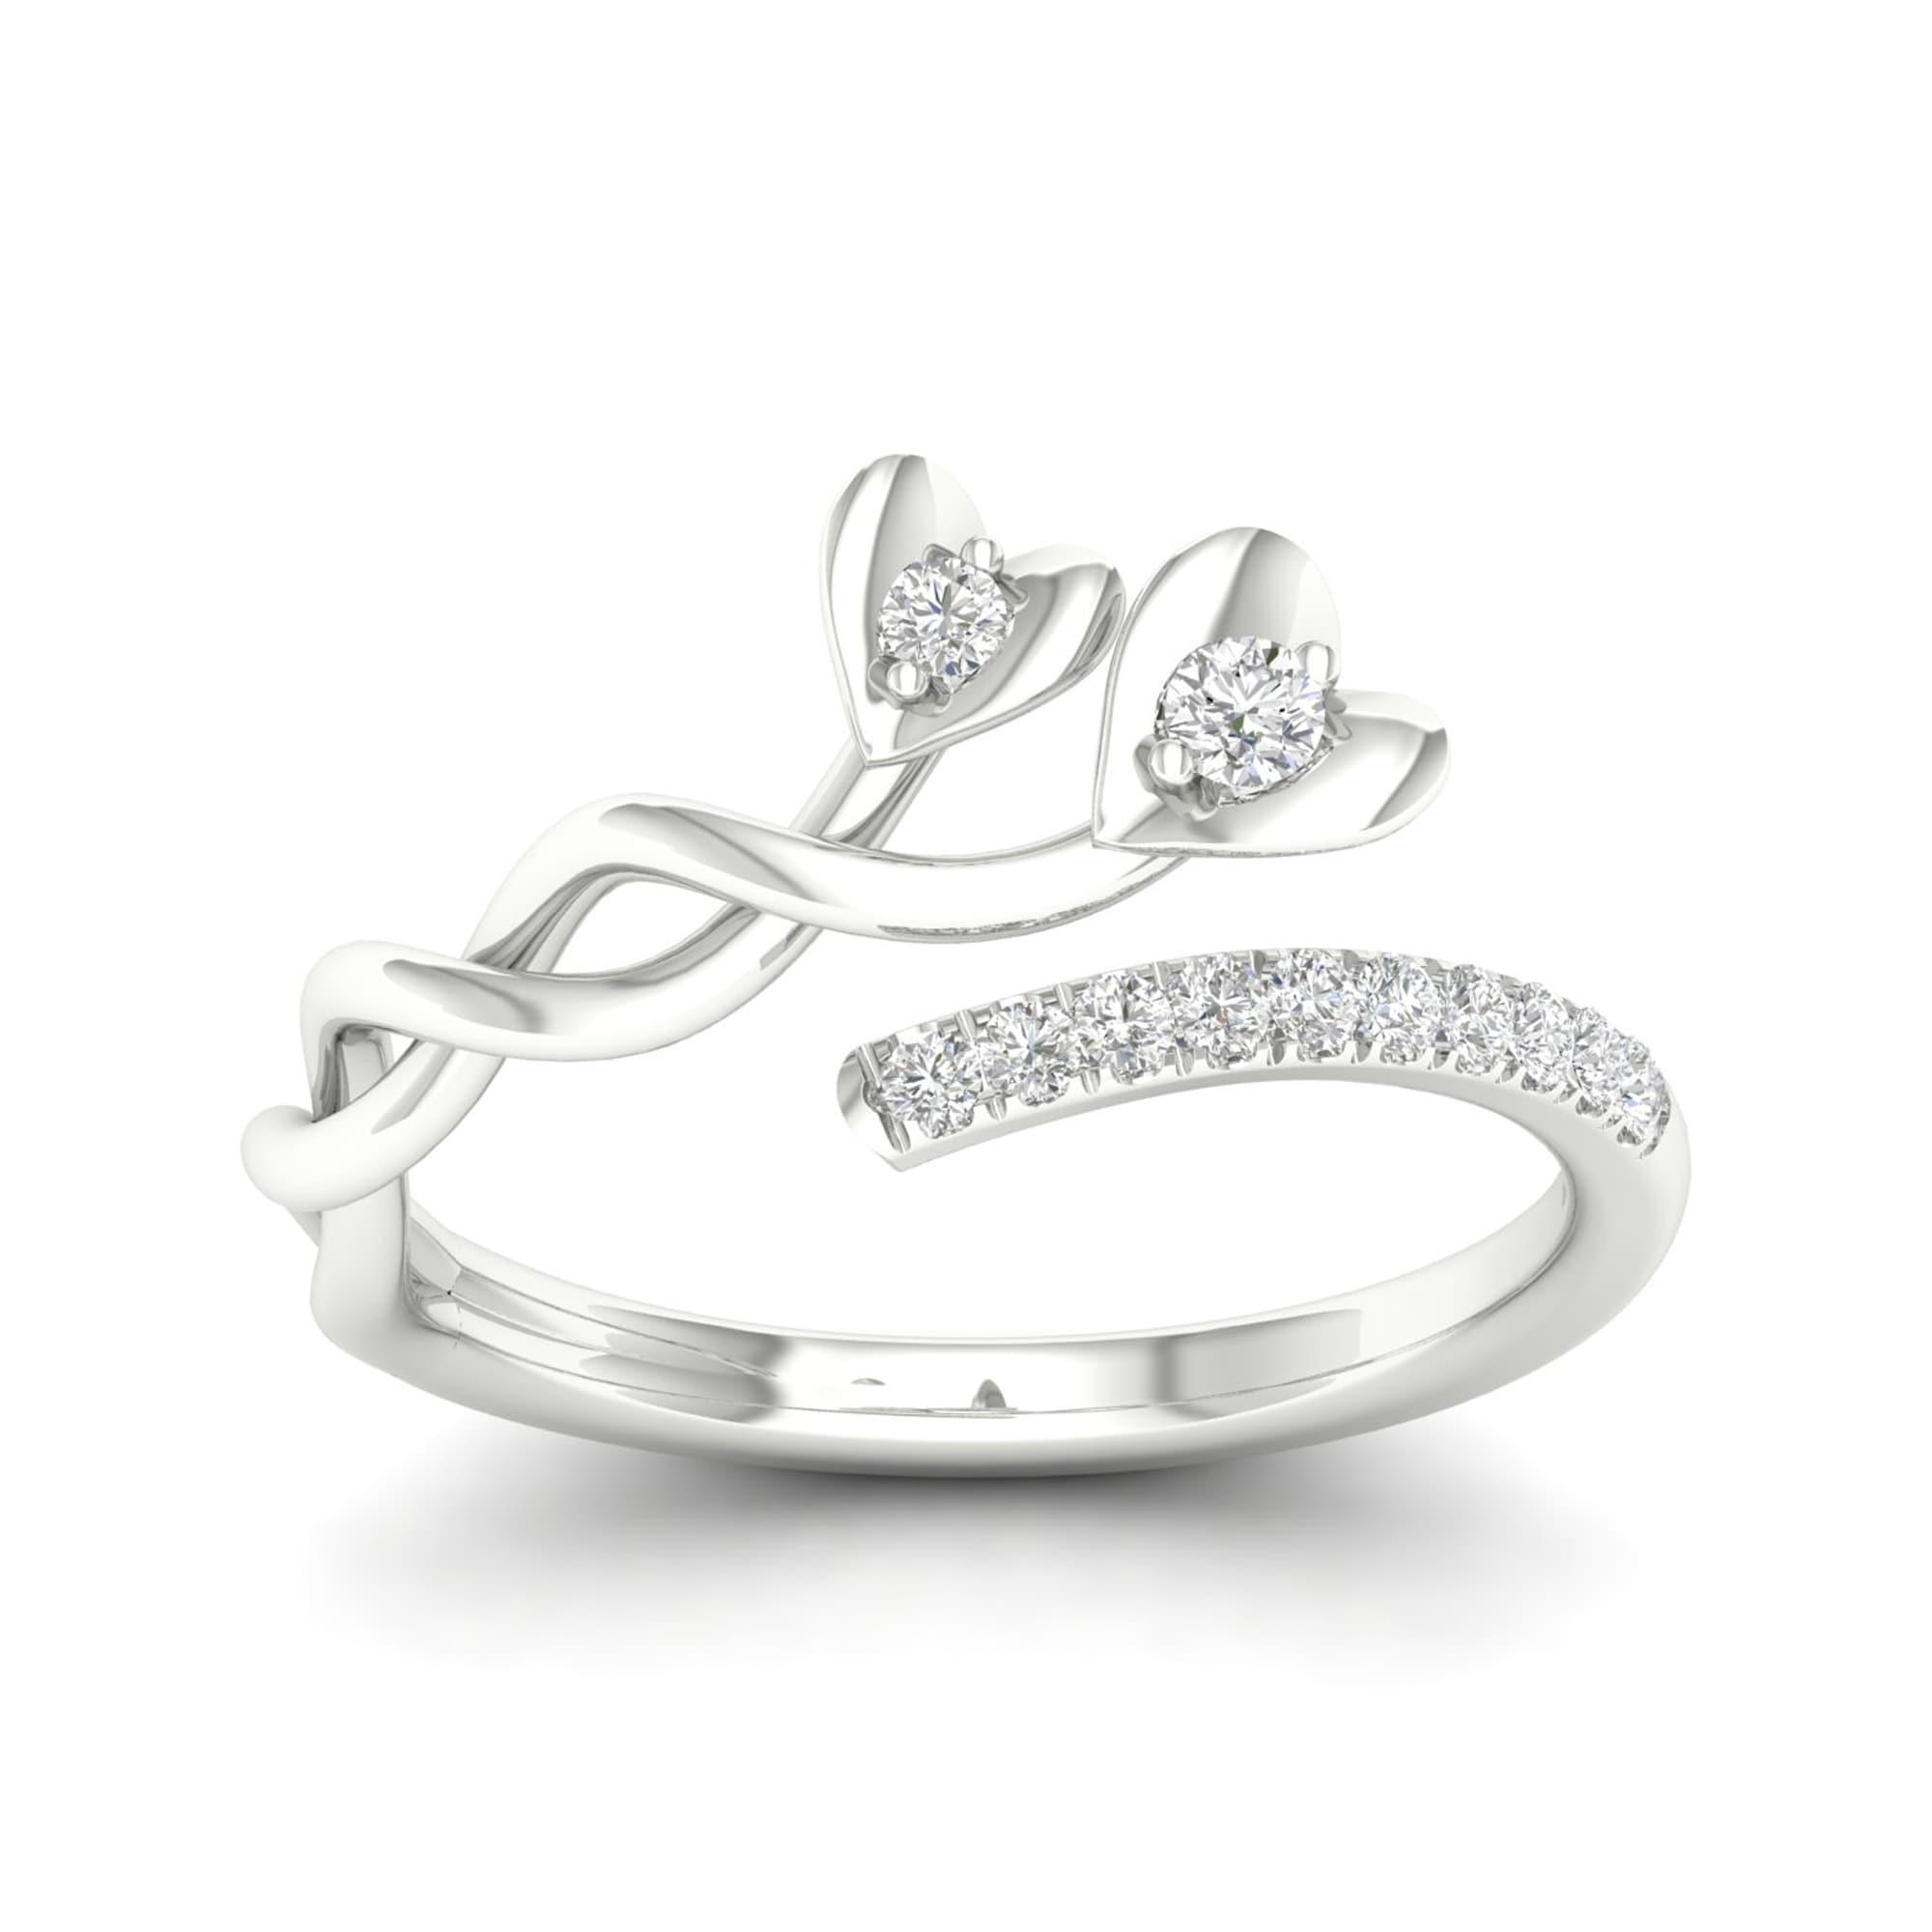 01c6be9502b8b7 Shop De Couer 10k White Gold 1/6ct TDW Diamond Heart Promise Ring ...